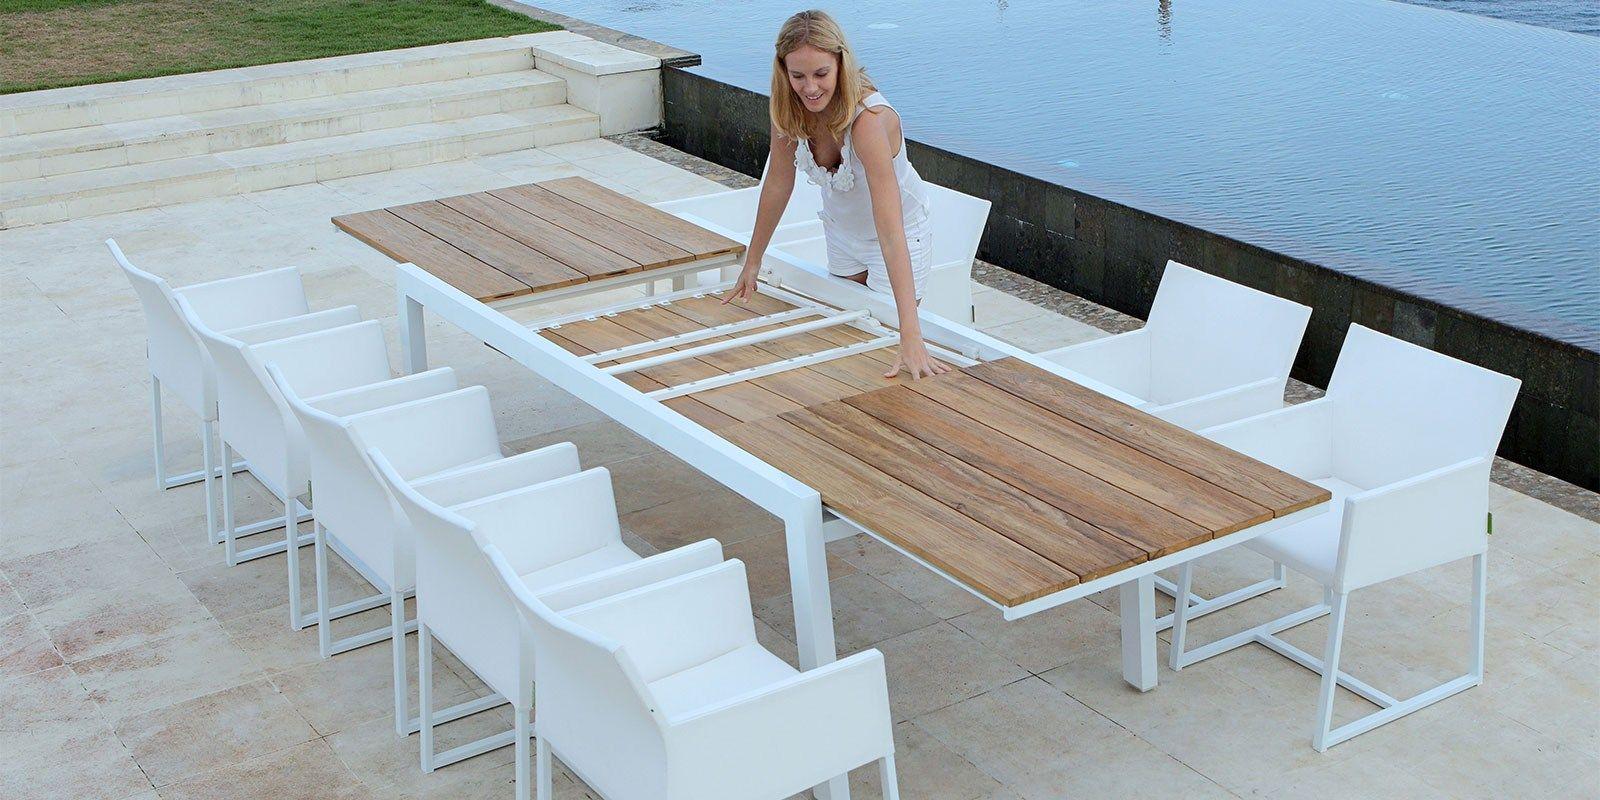 Emejing tavolo giardino allungabile images for Tavoli allungabili quadrati